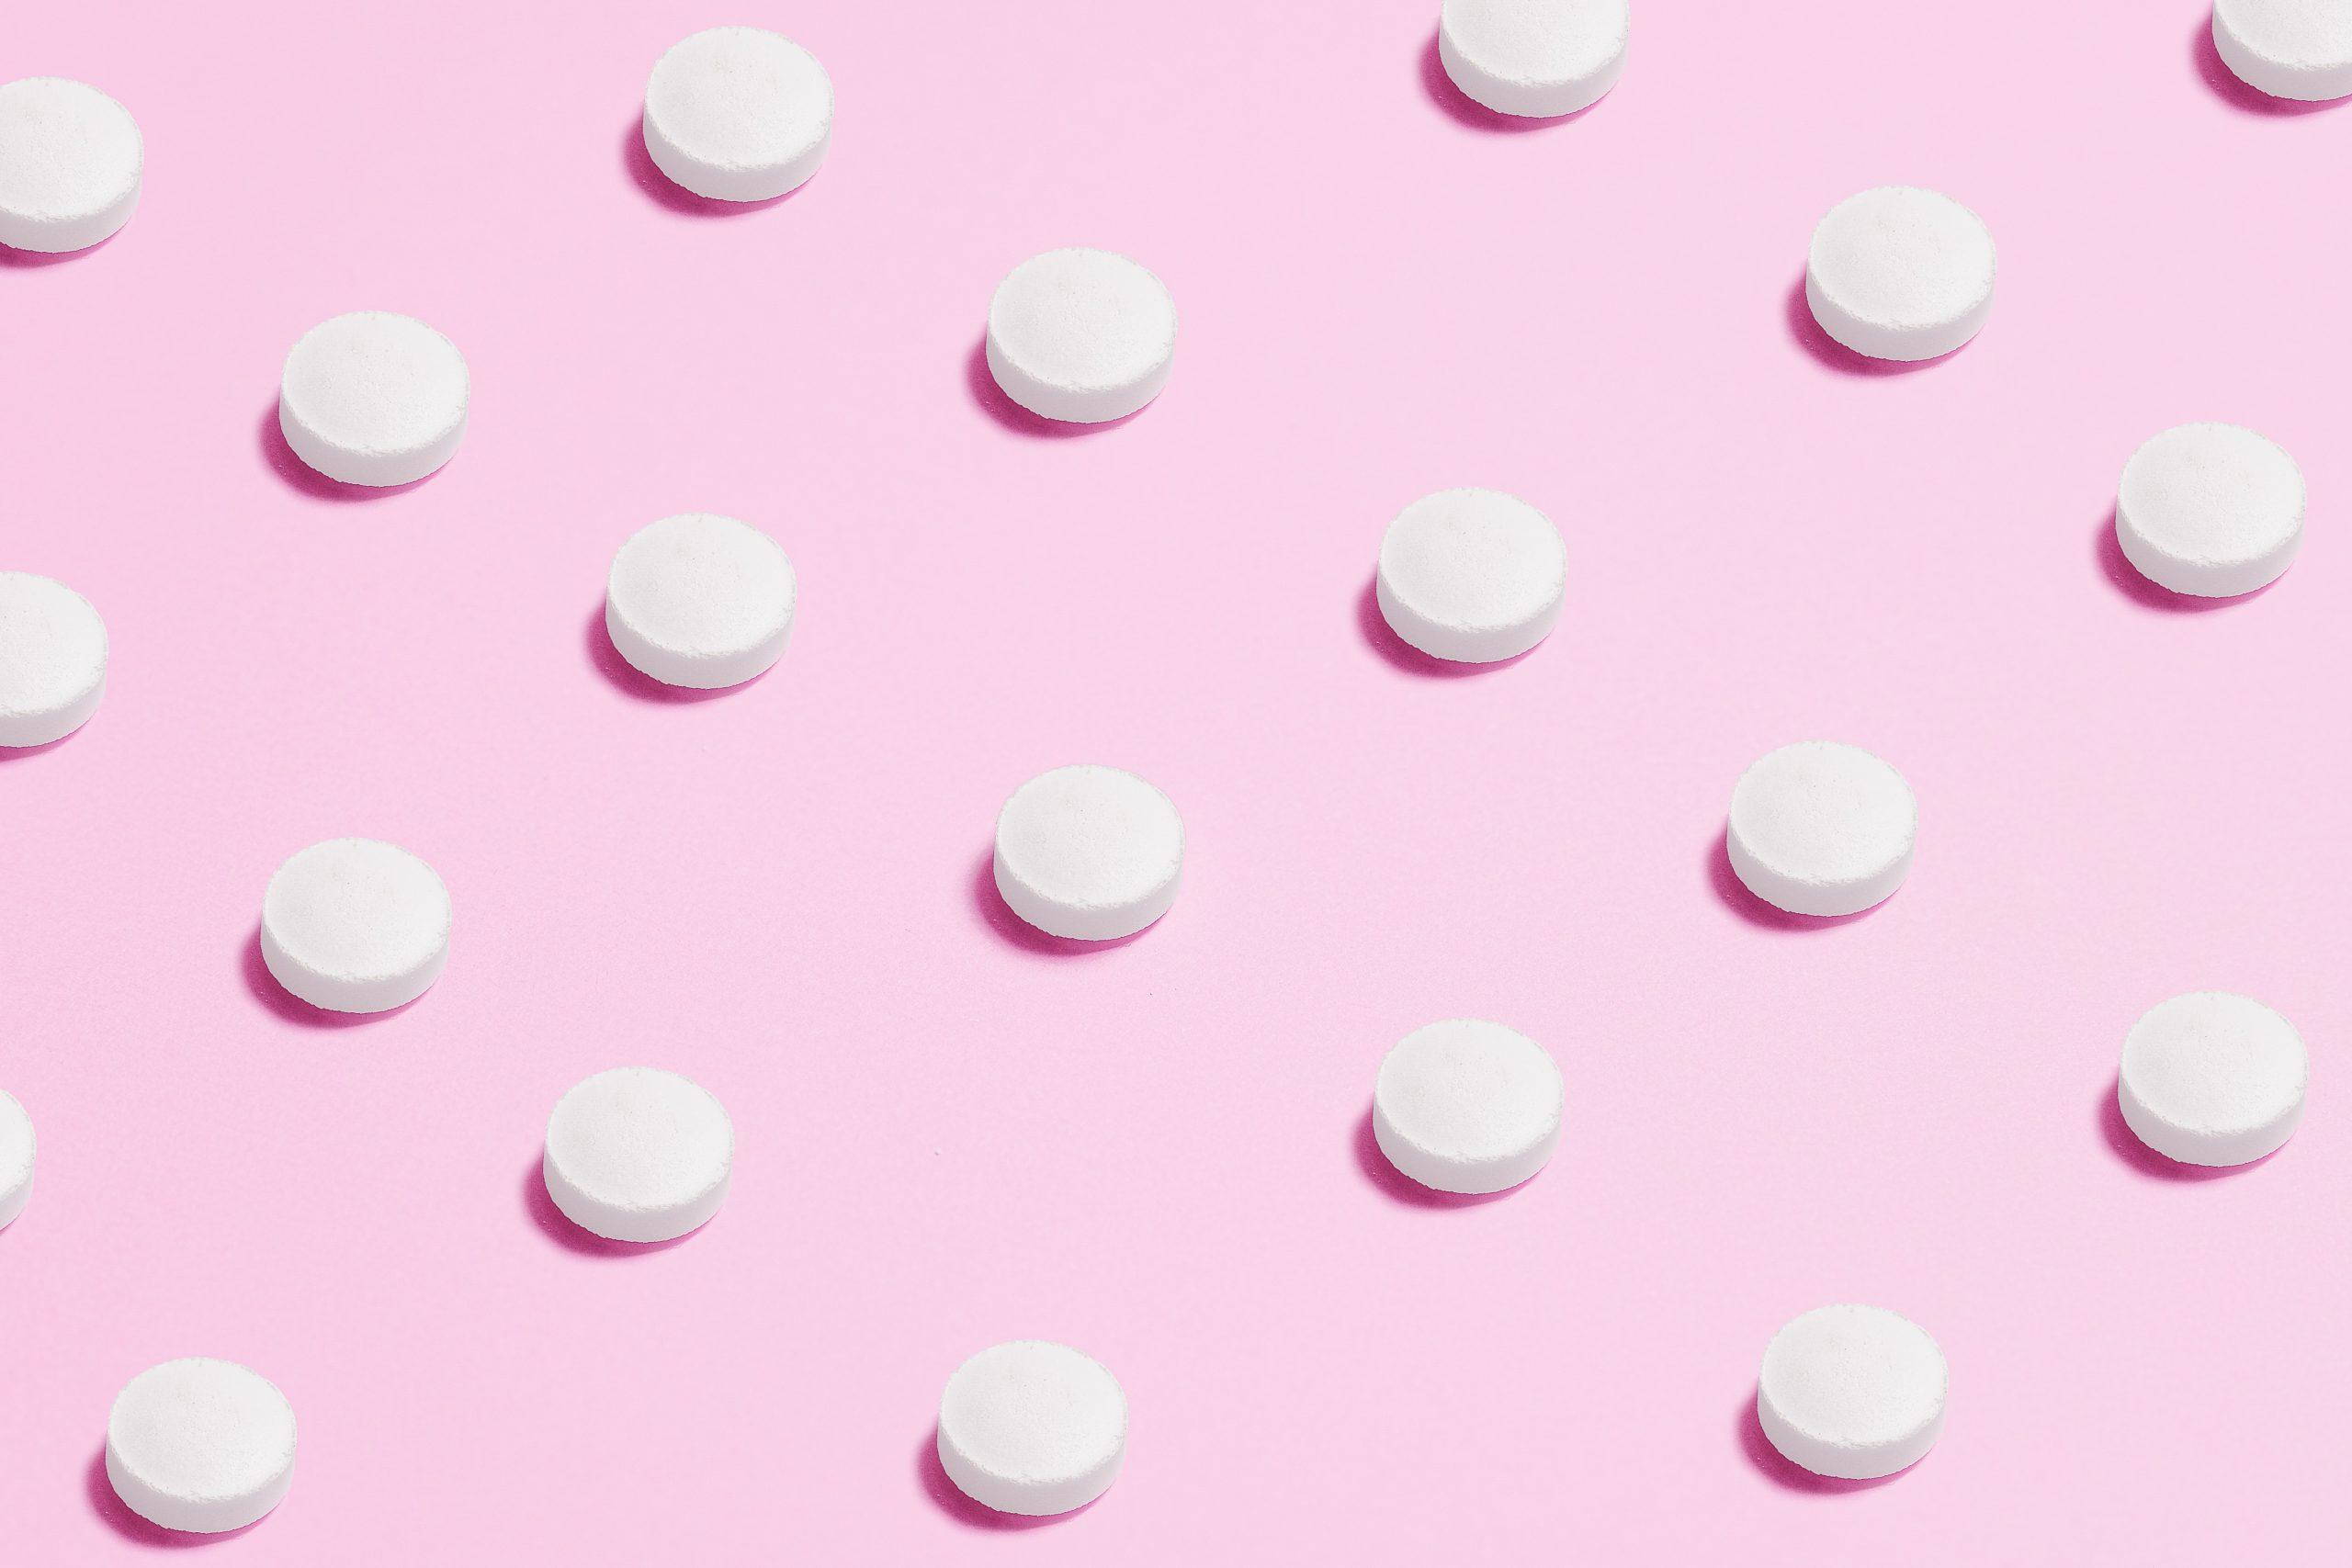 Common Antidepressant Clomipramine Hydrochloride Recall